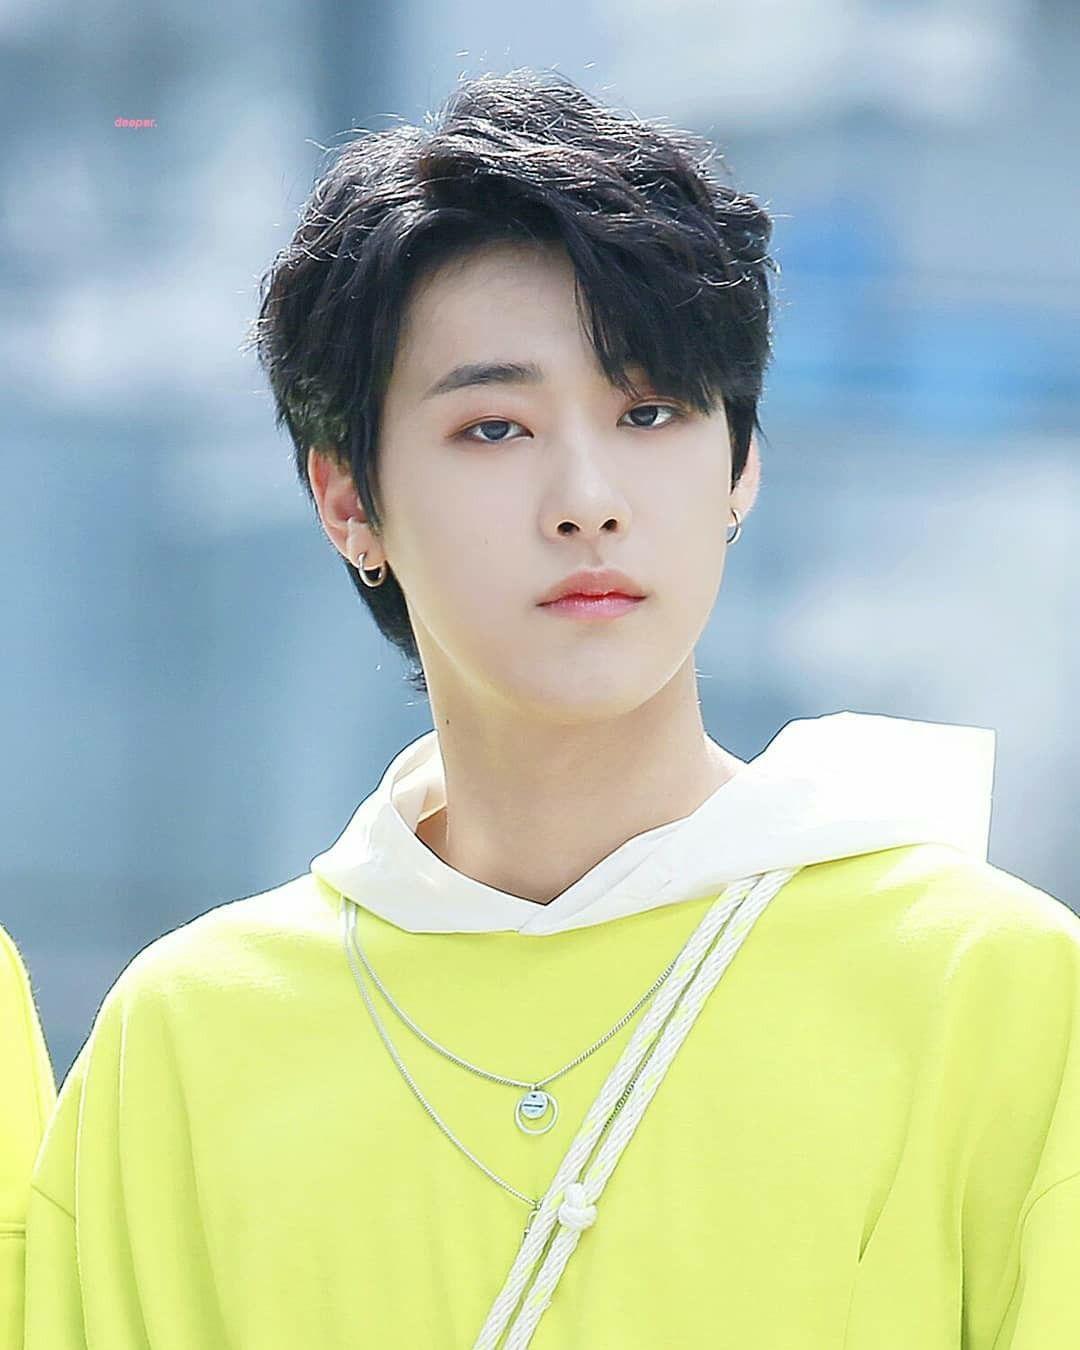 ouiboys-kim-yo-han-kim-dong-han-jang-dae-hyun-more-drop-teaser-for-official-group-debut-4